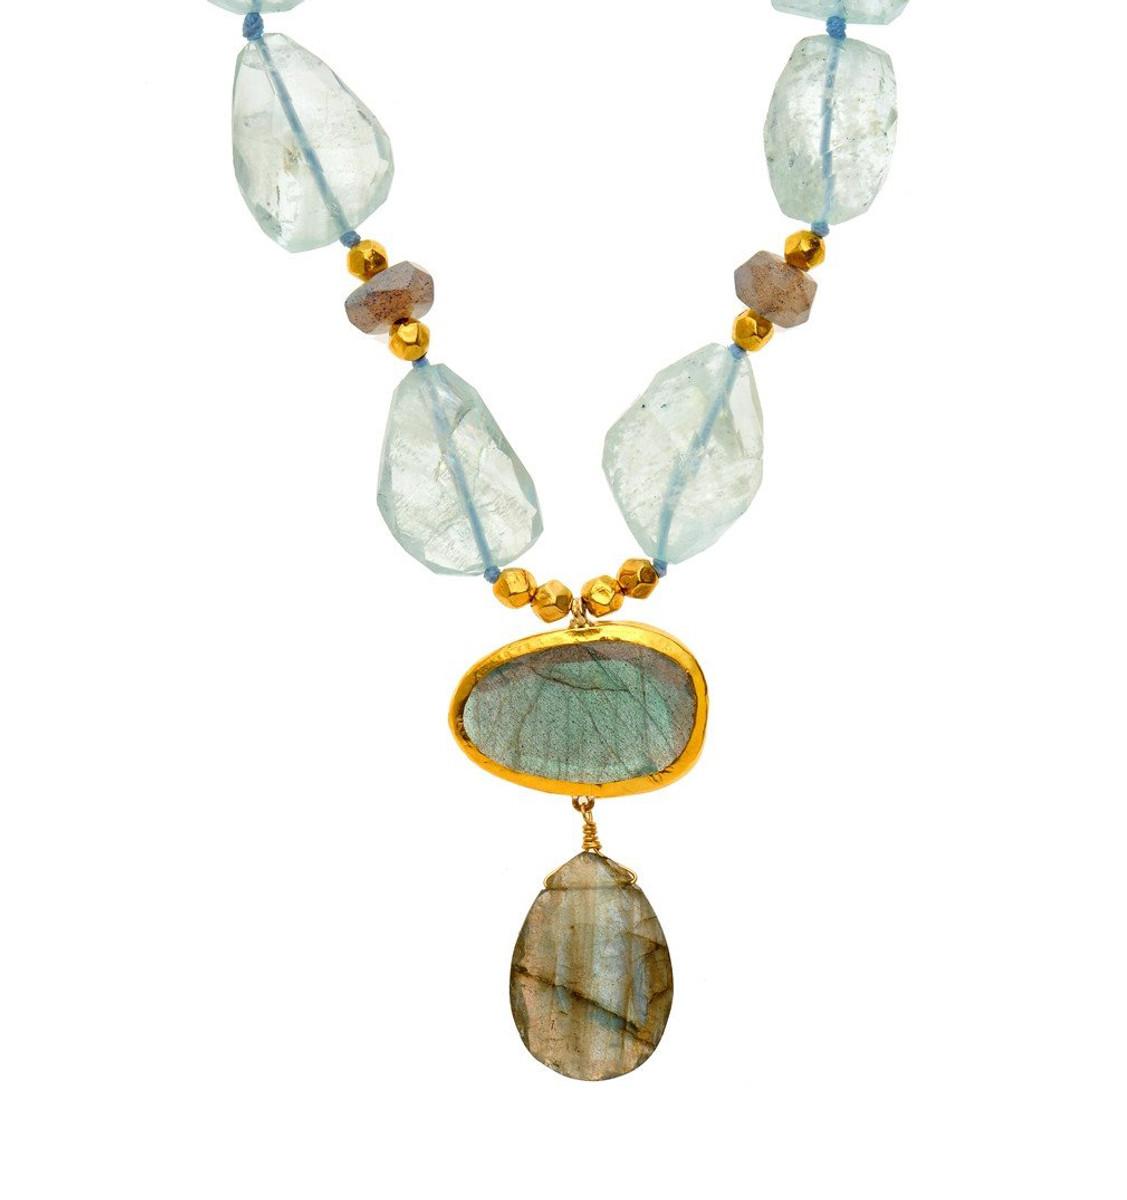 Aqua Nugget and Labradorite Necklace by Nava Zahavi - New Arrival